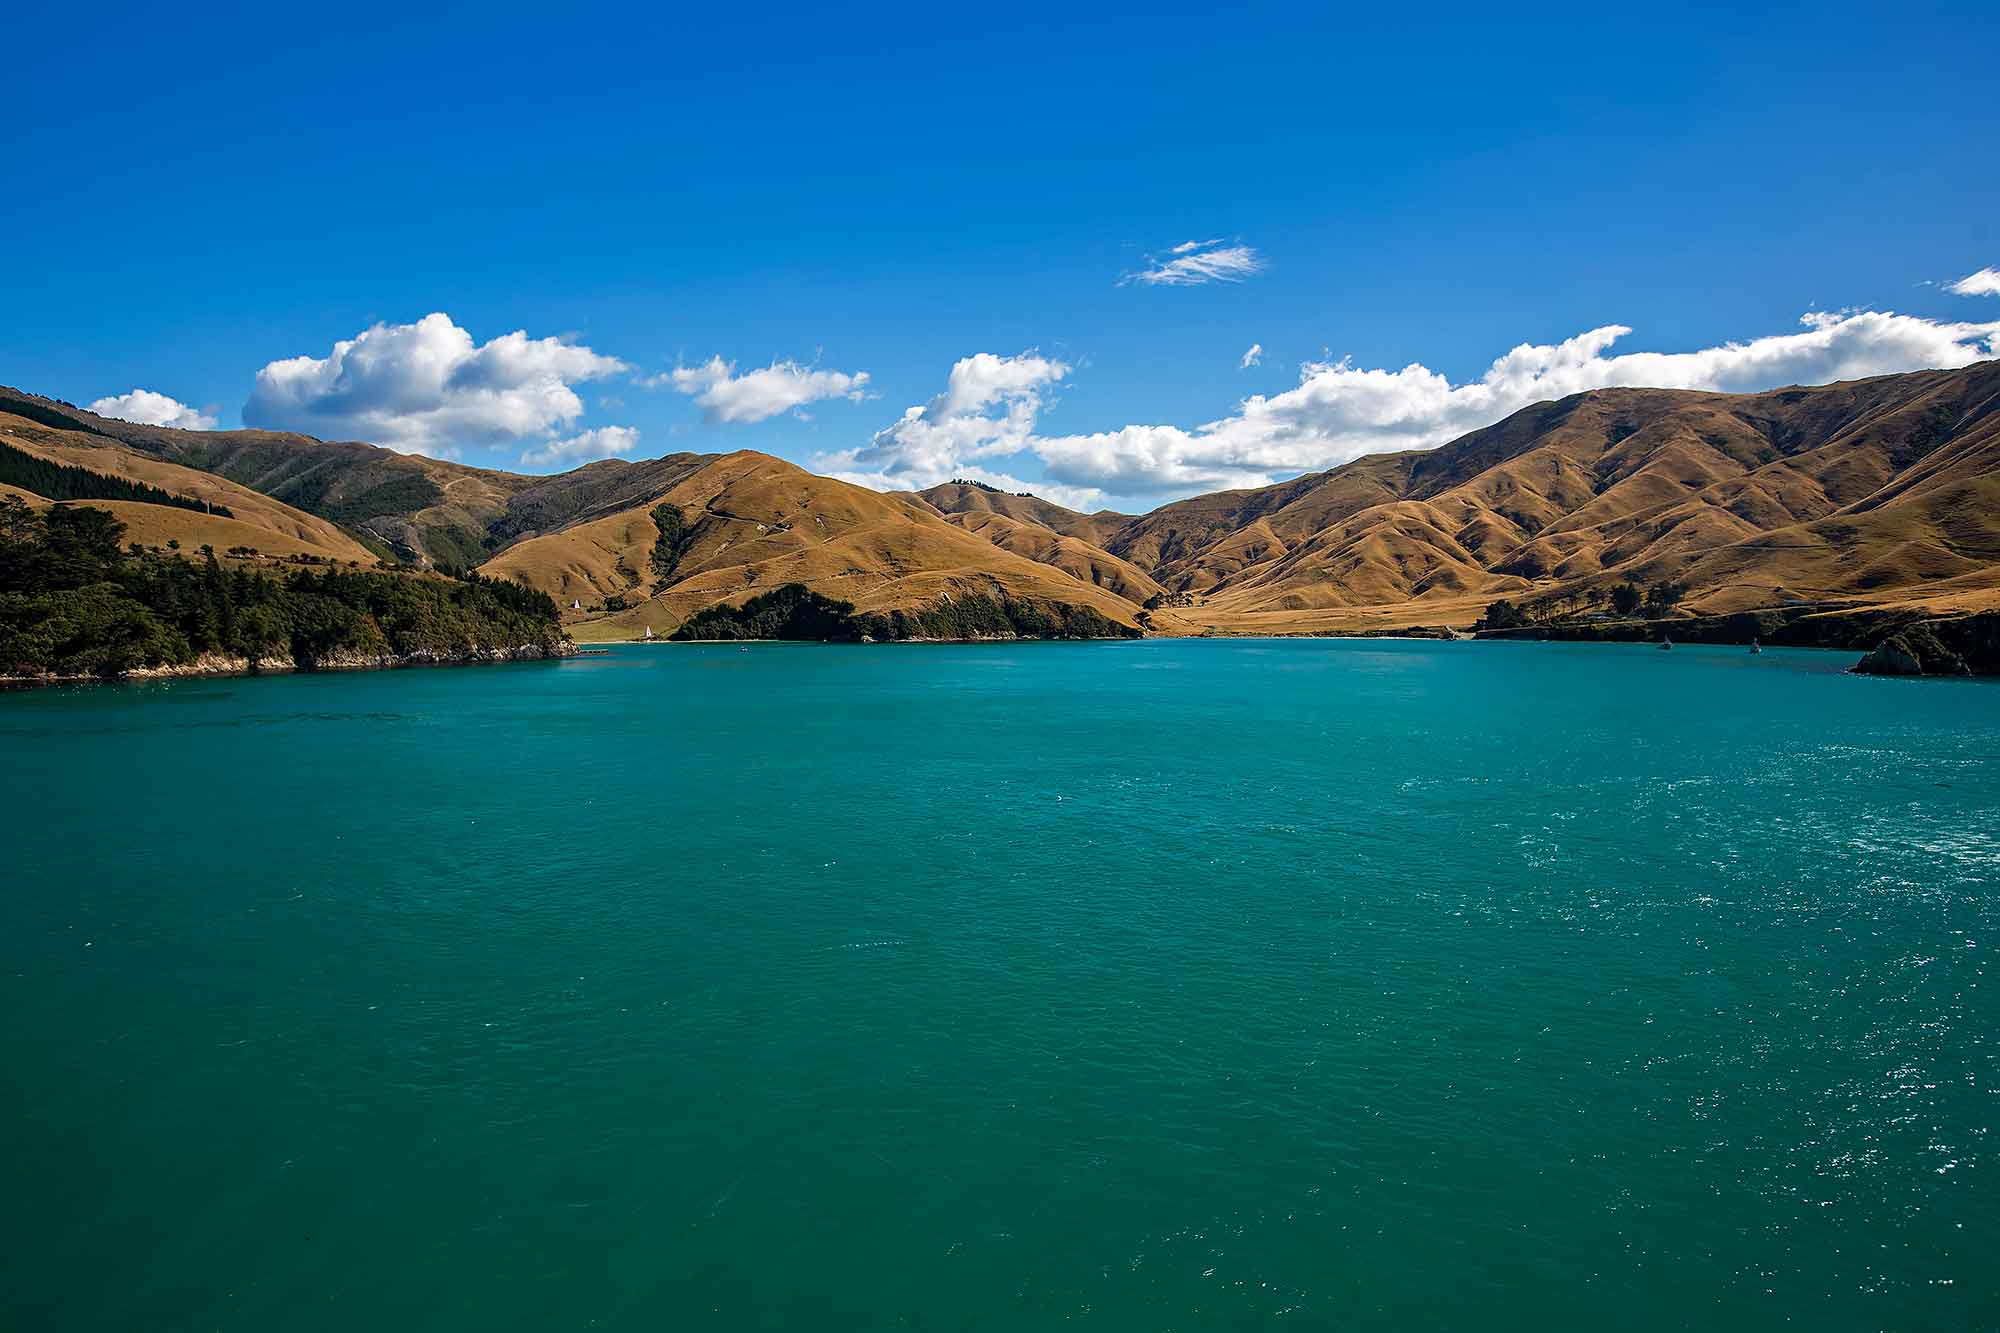 Cook Strait, New Zealand. © Ulli Maier & Nisa Maier